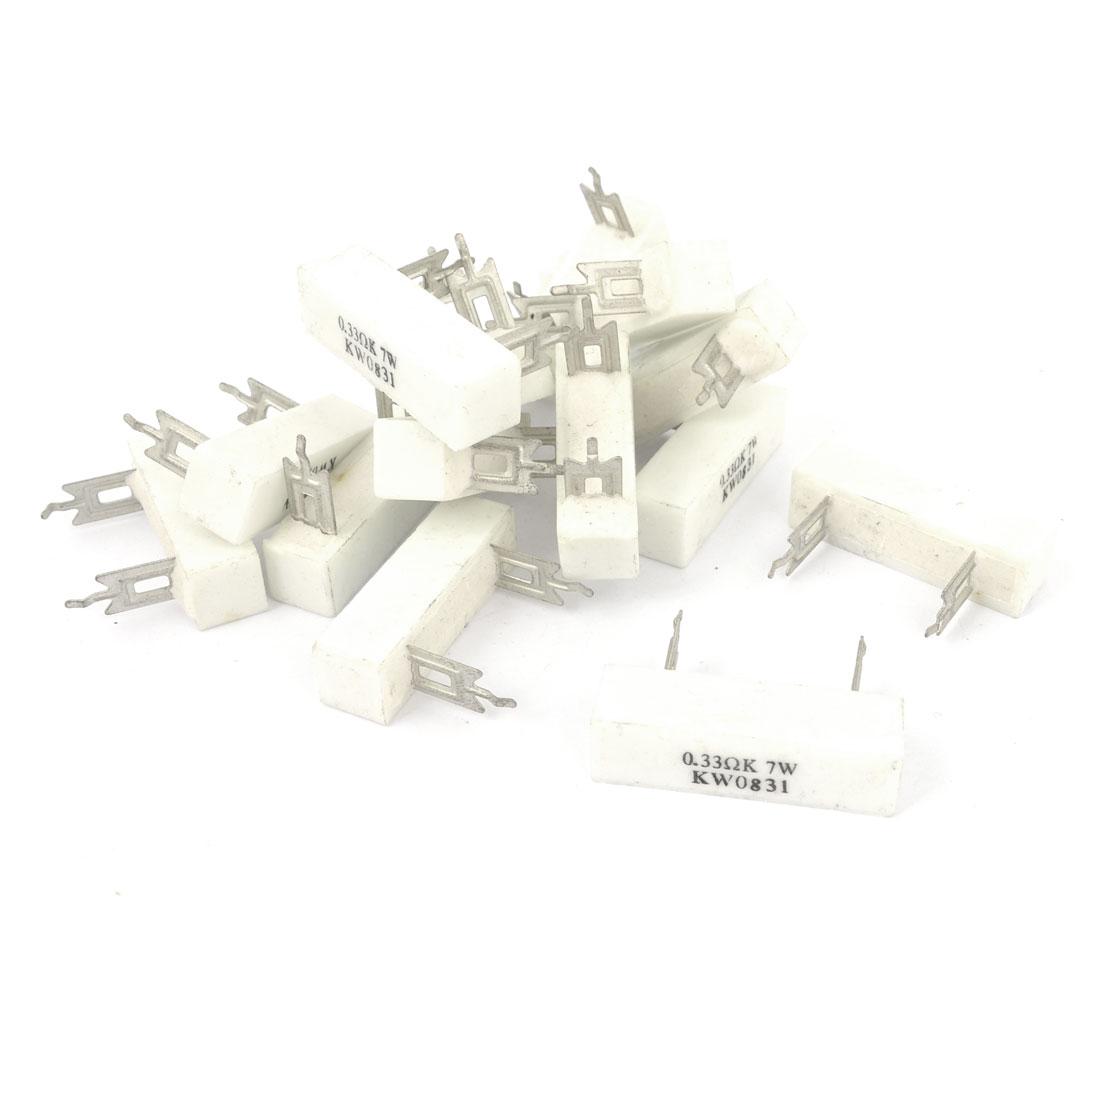 15 Pieces 0.33 Ohm 10% Tolerance 7 Watt Ceramic Cement Power Resistor